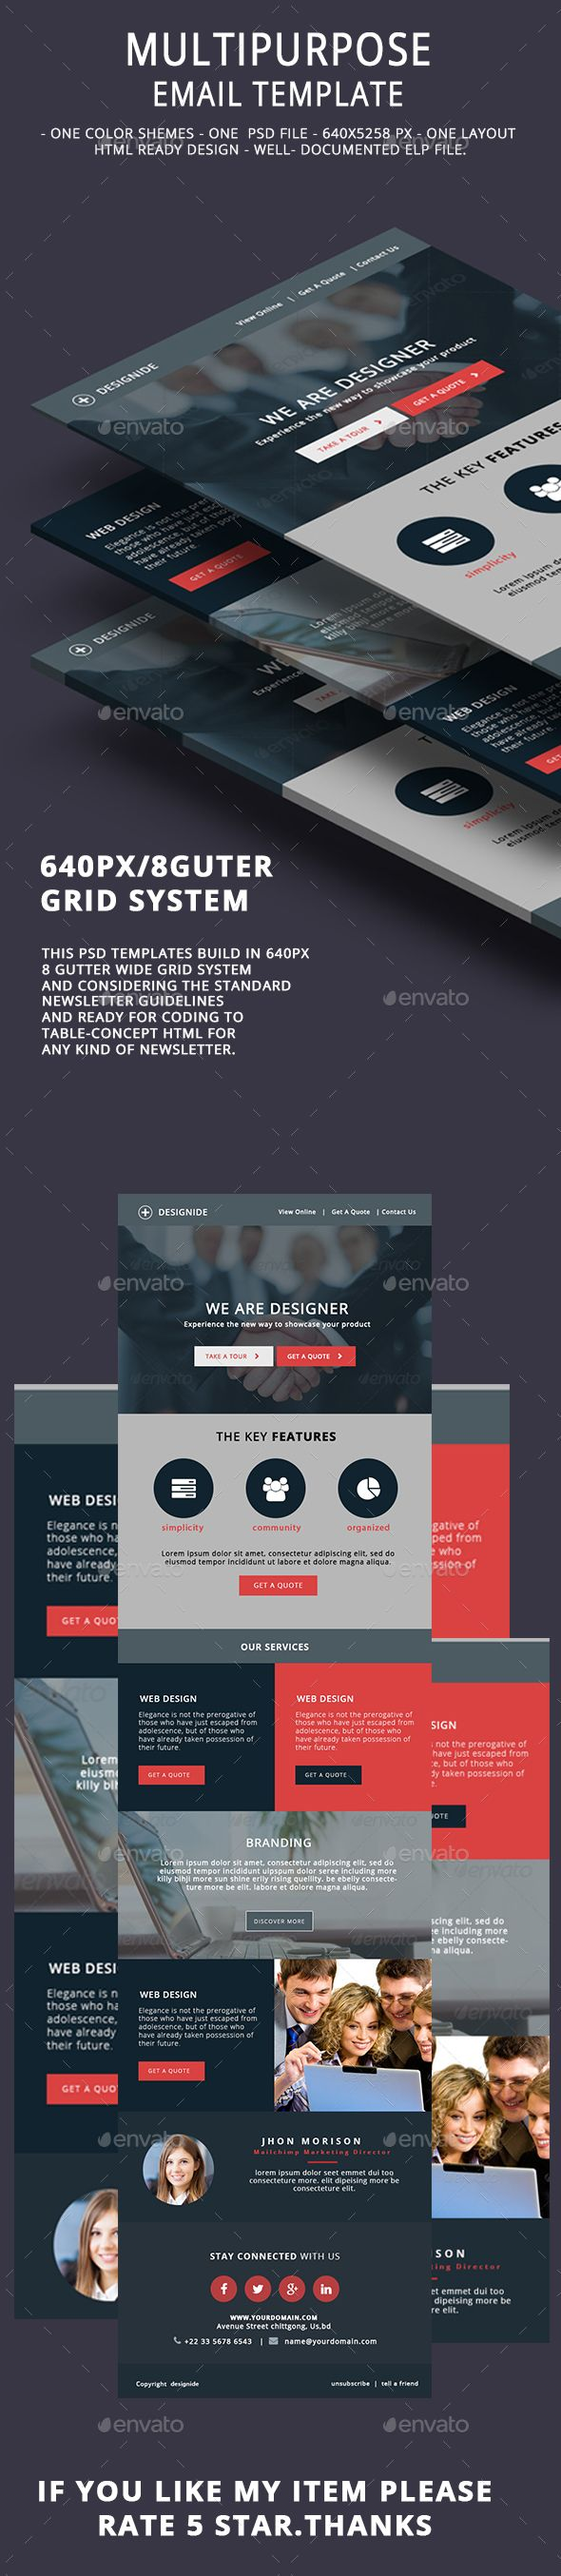 Multipurpose Email Template V13 | Pinterest | Template, Corporate ...